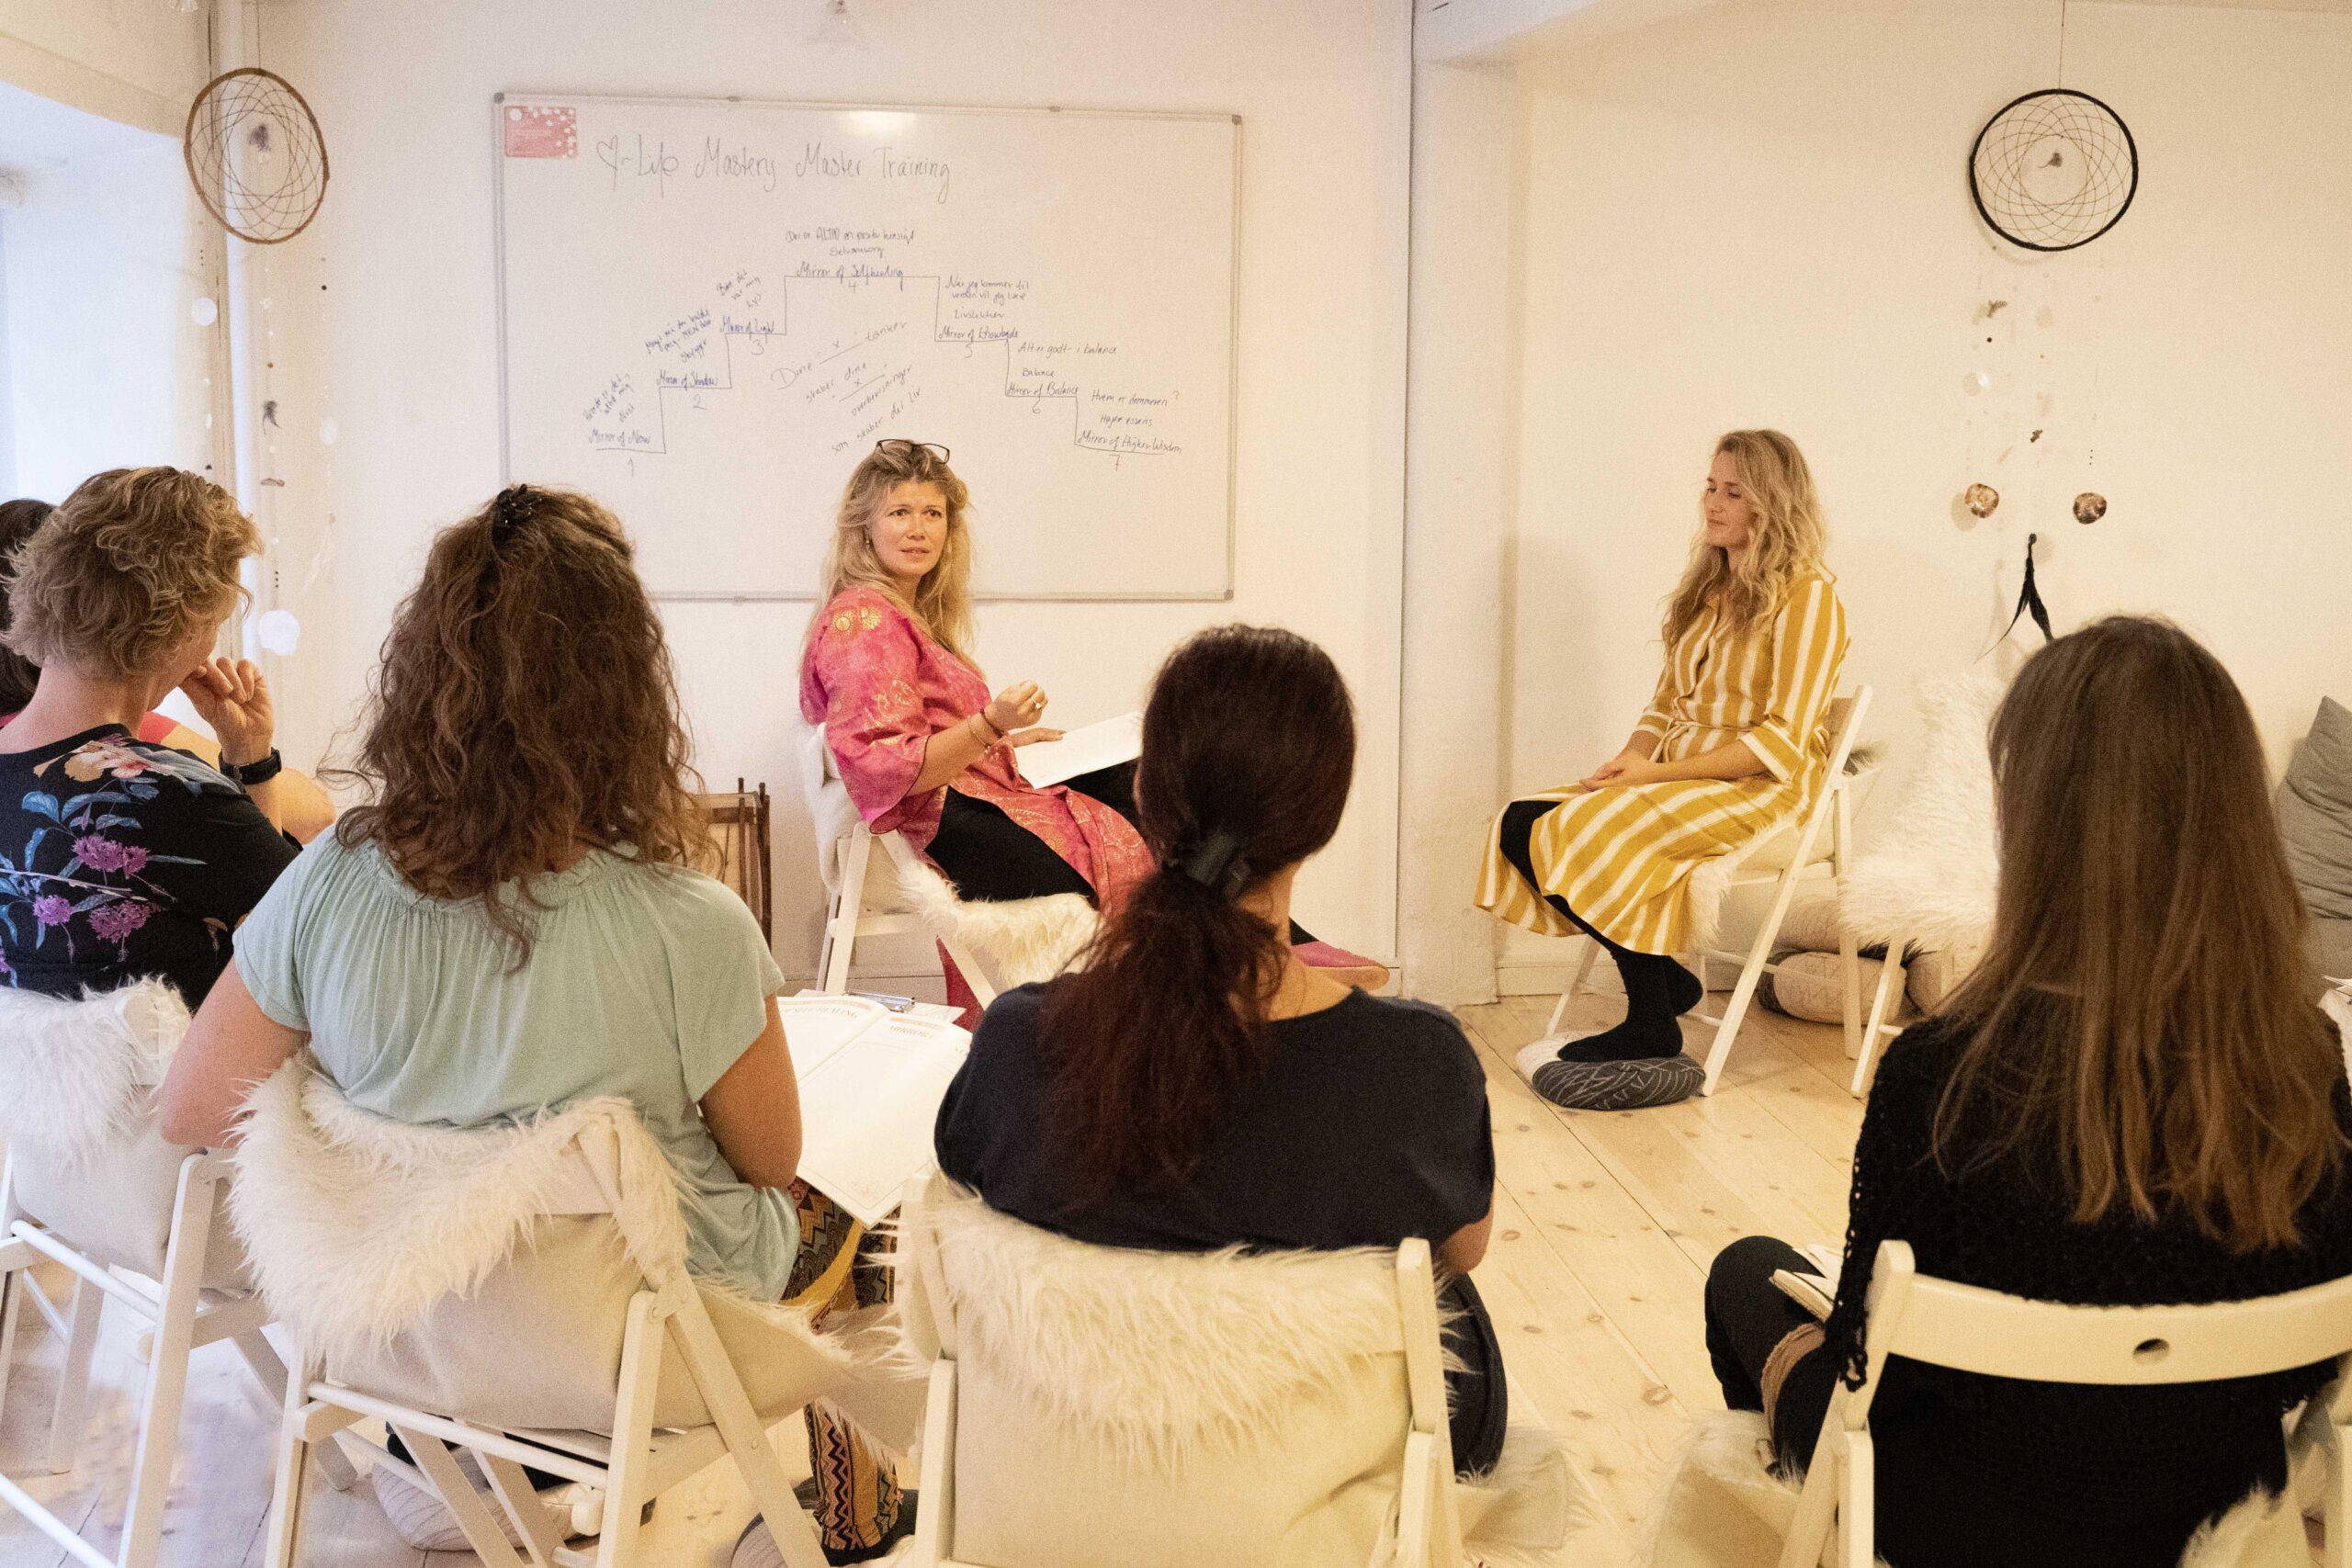 Life Mastery Master training - mirrorwork